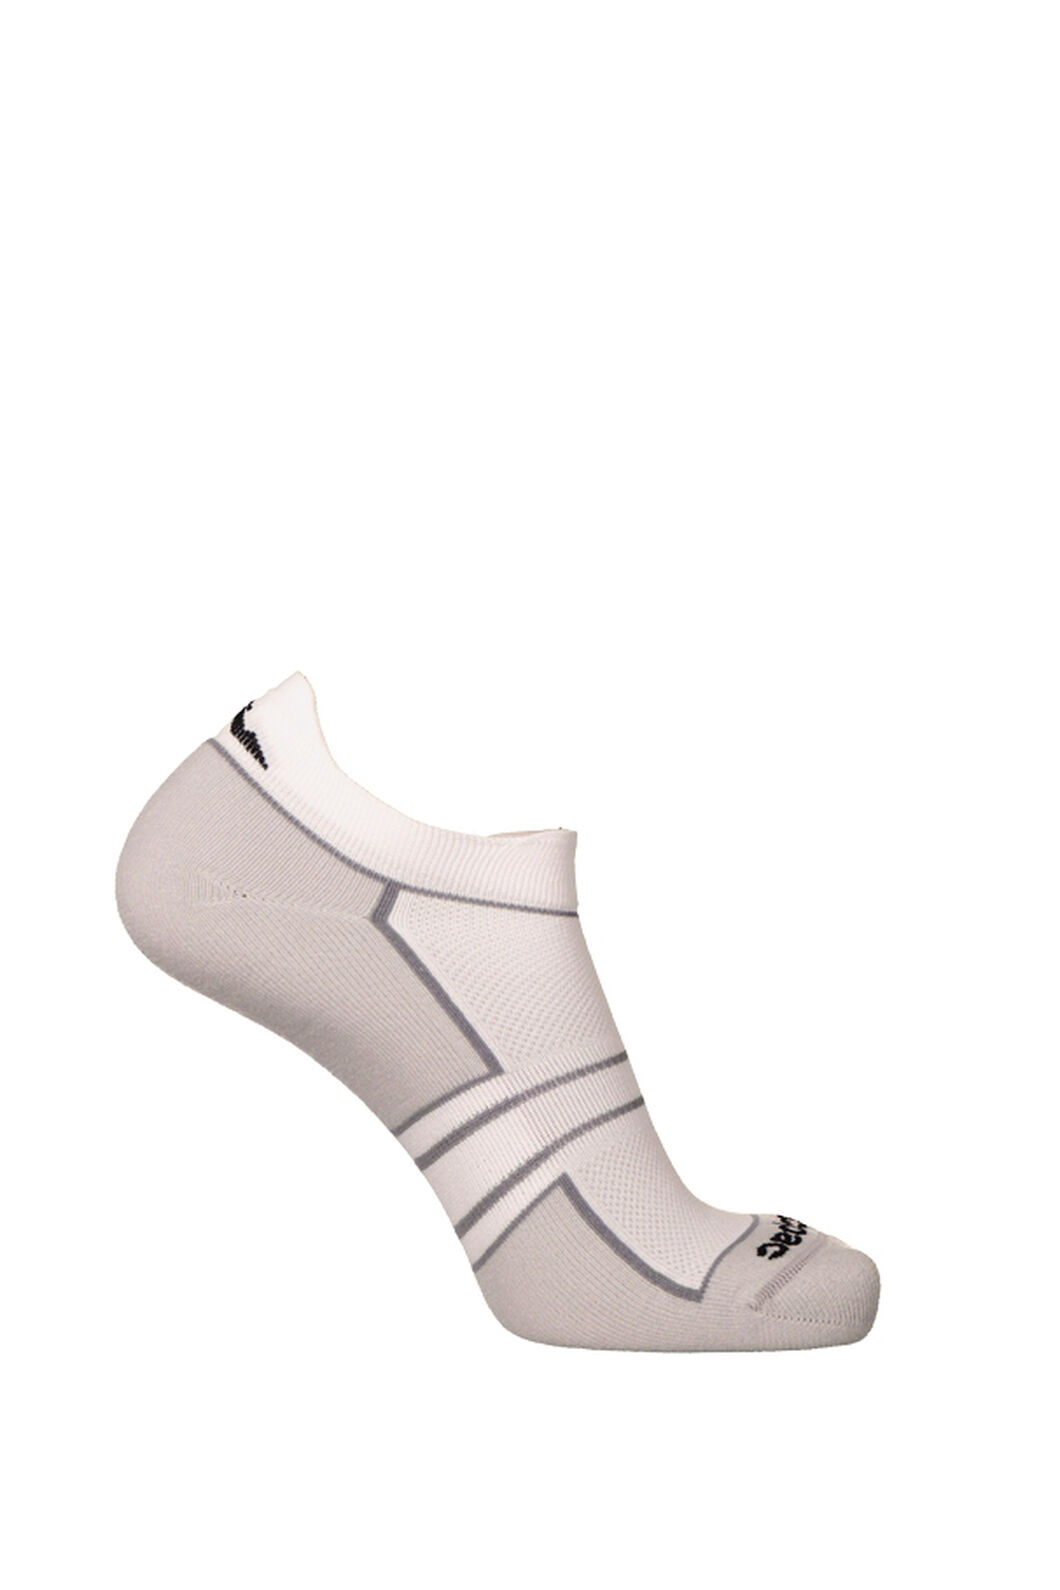 Macpac Light Trail Run Socks 2 Pack, Black/White, hi-res